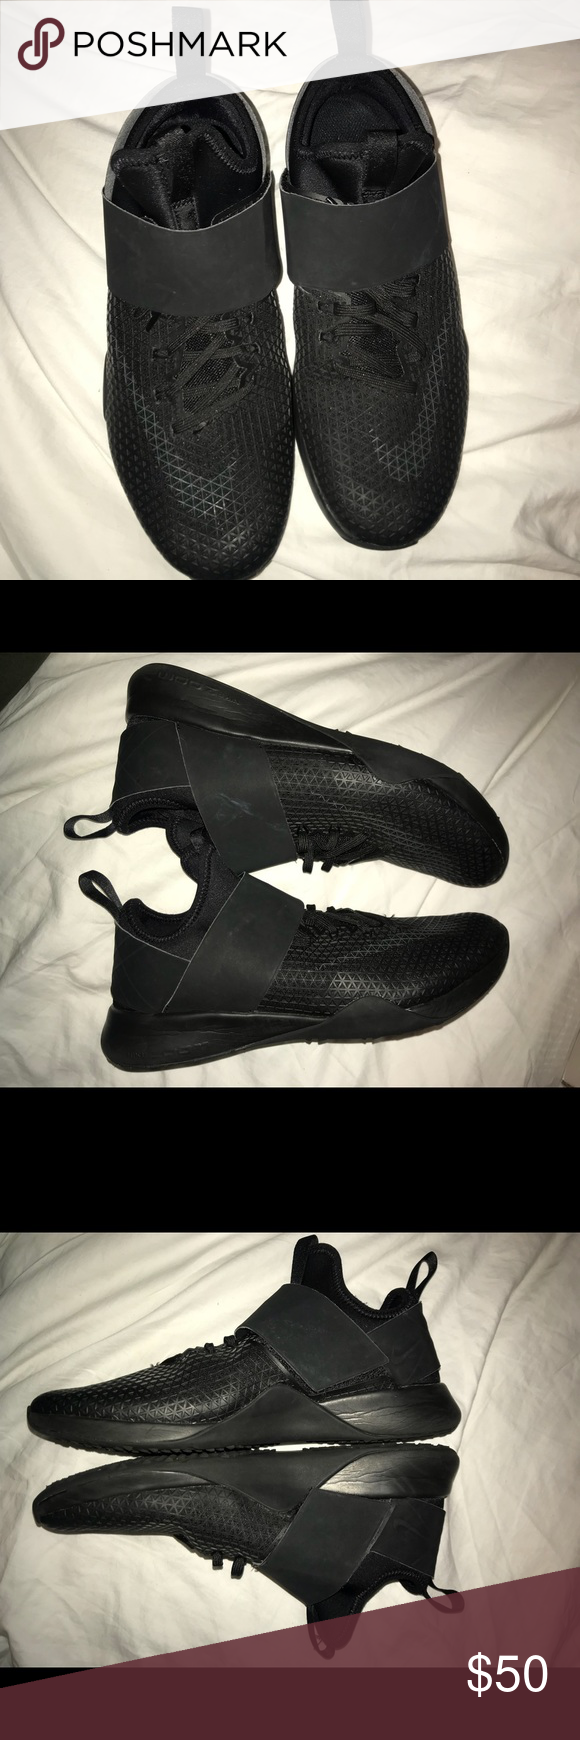 Todo Negro 8 Nike Air Zoom Tamaño 8 Negro Mujeres Zapatos Negro Nike Air Zoom a39c49